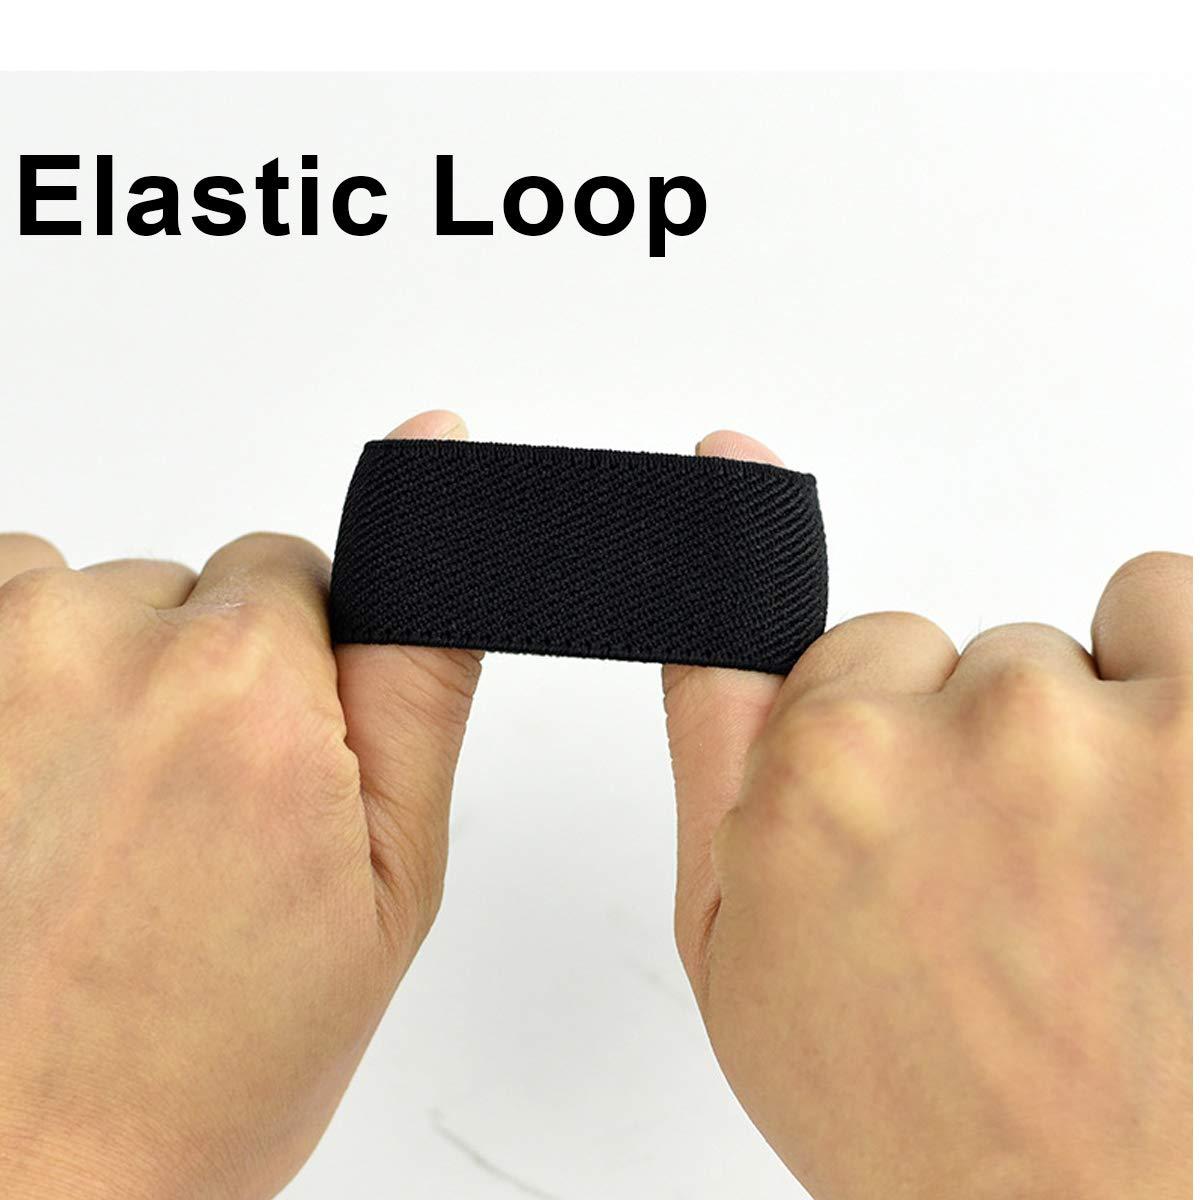 Hoanan Nylon Elastic Belt Loop Keeper for 1.25//1.5inch Wide Belts